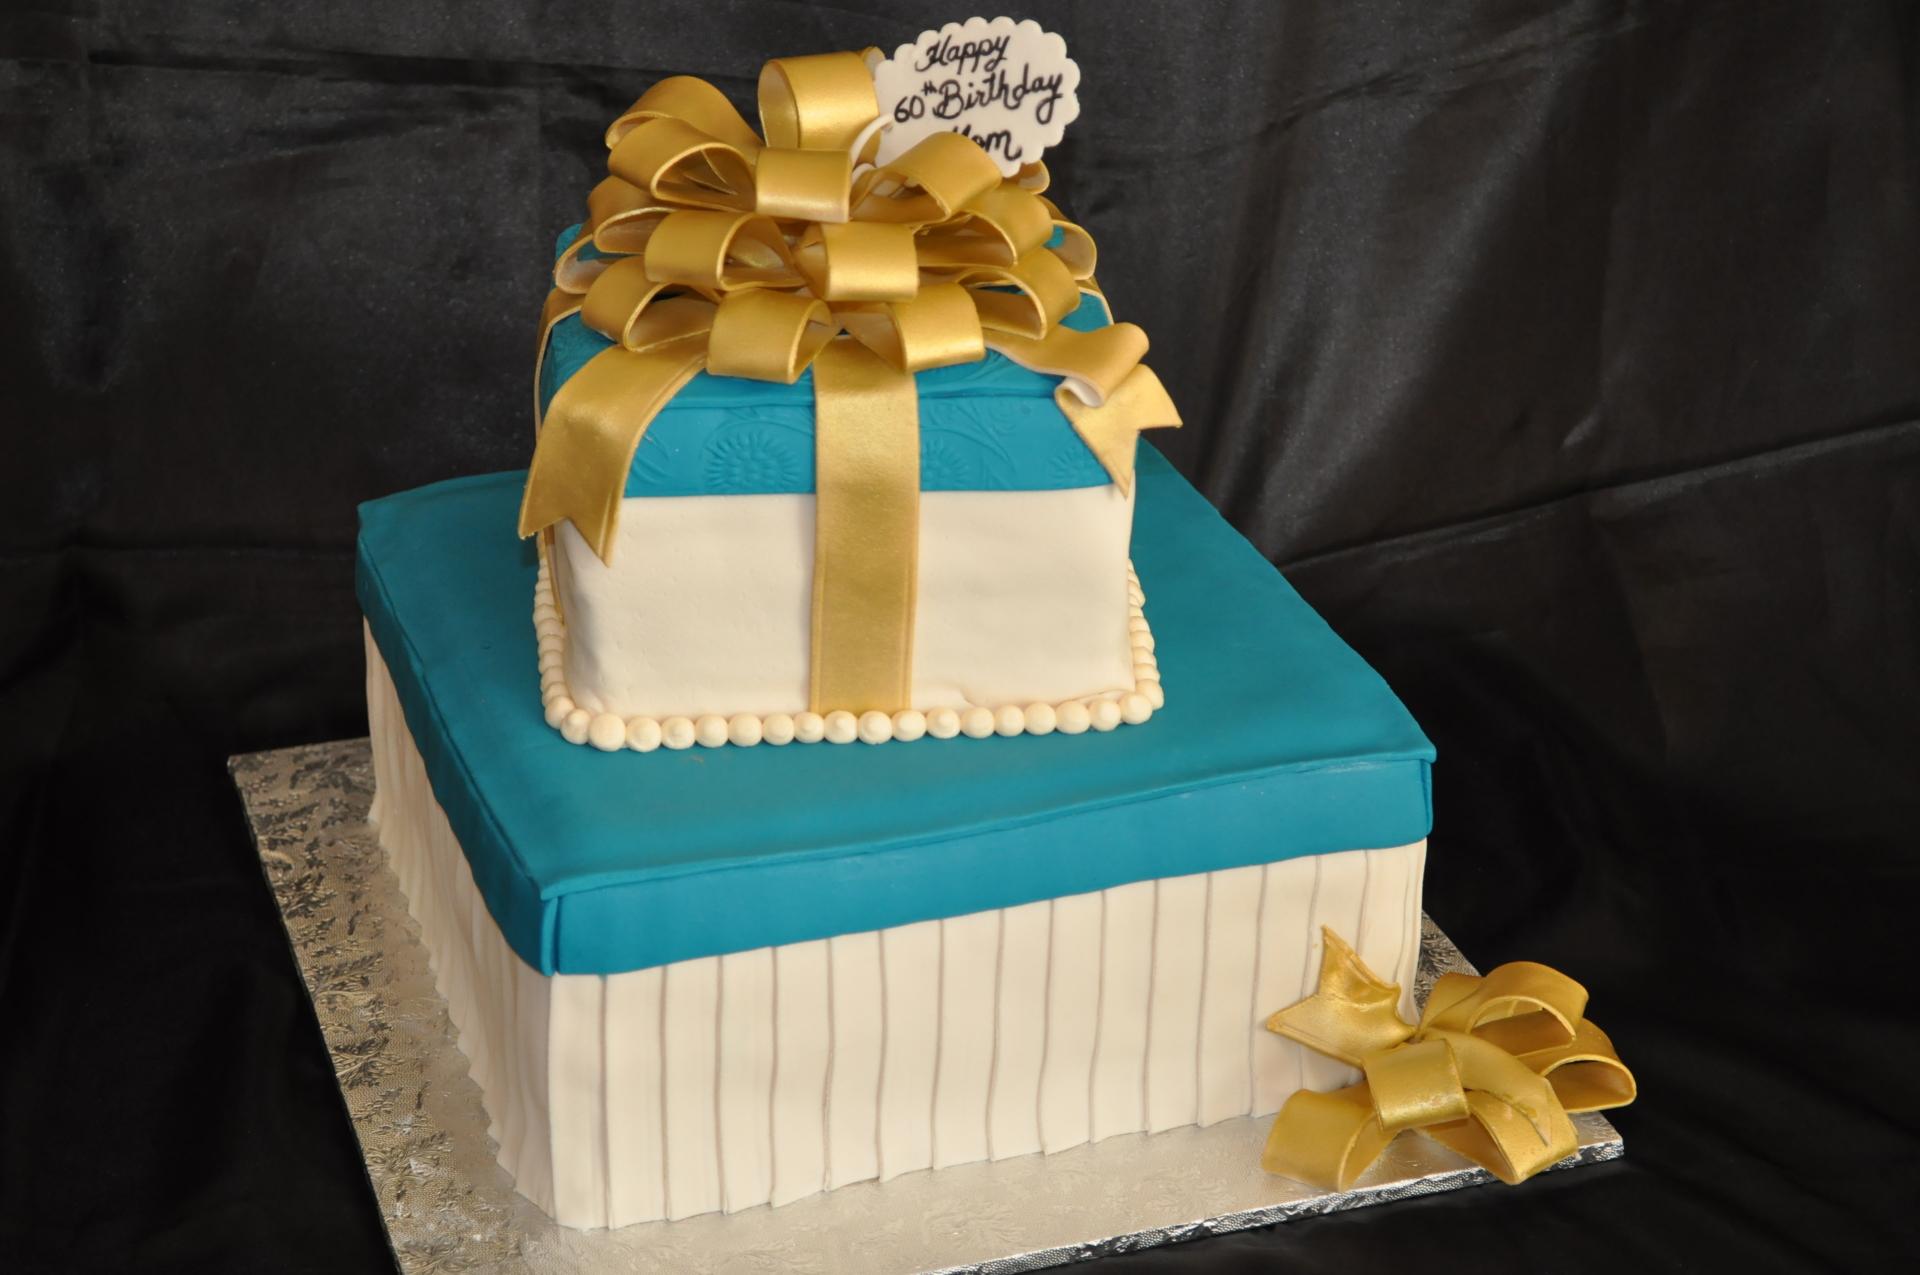 Gift box cake,gold bow cake, stacked gift boxes cake